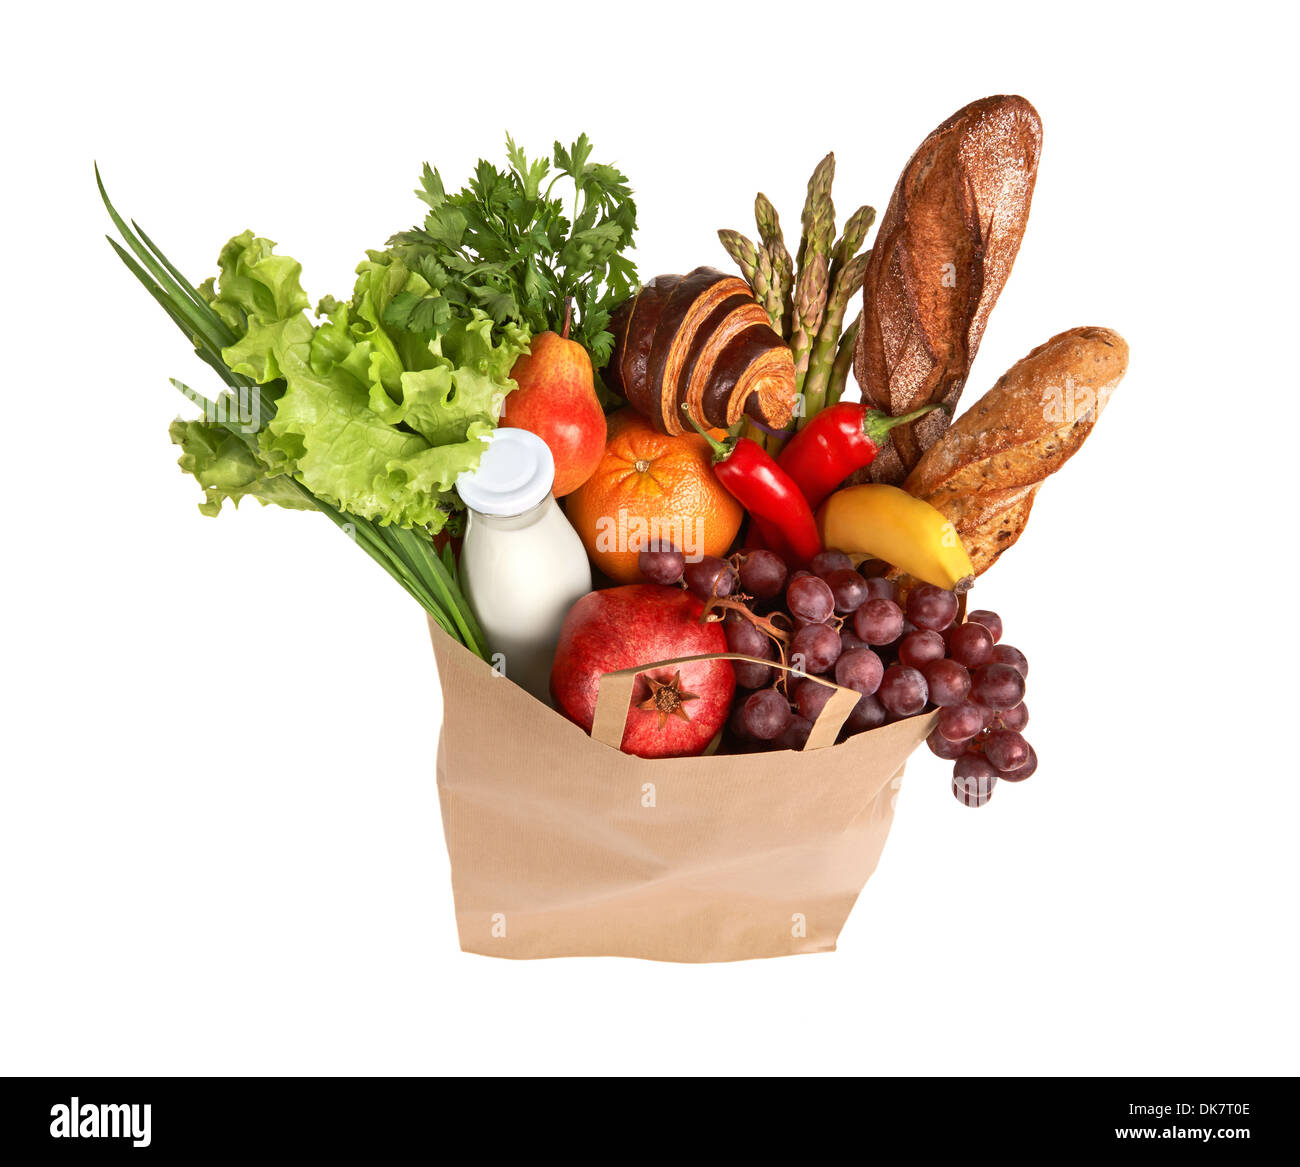 Eco friendly food shopping Photo Stock